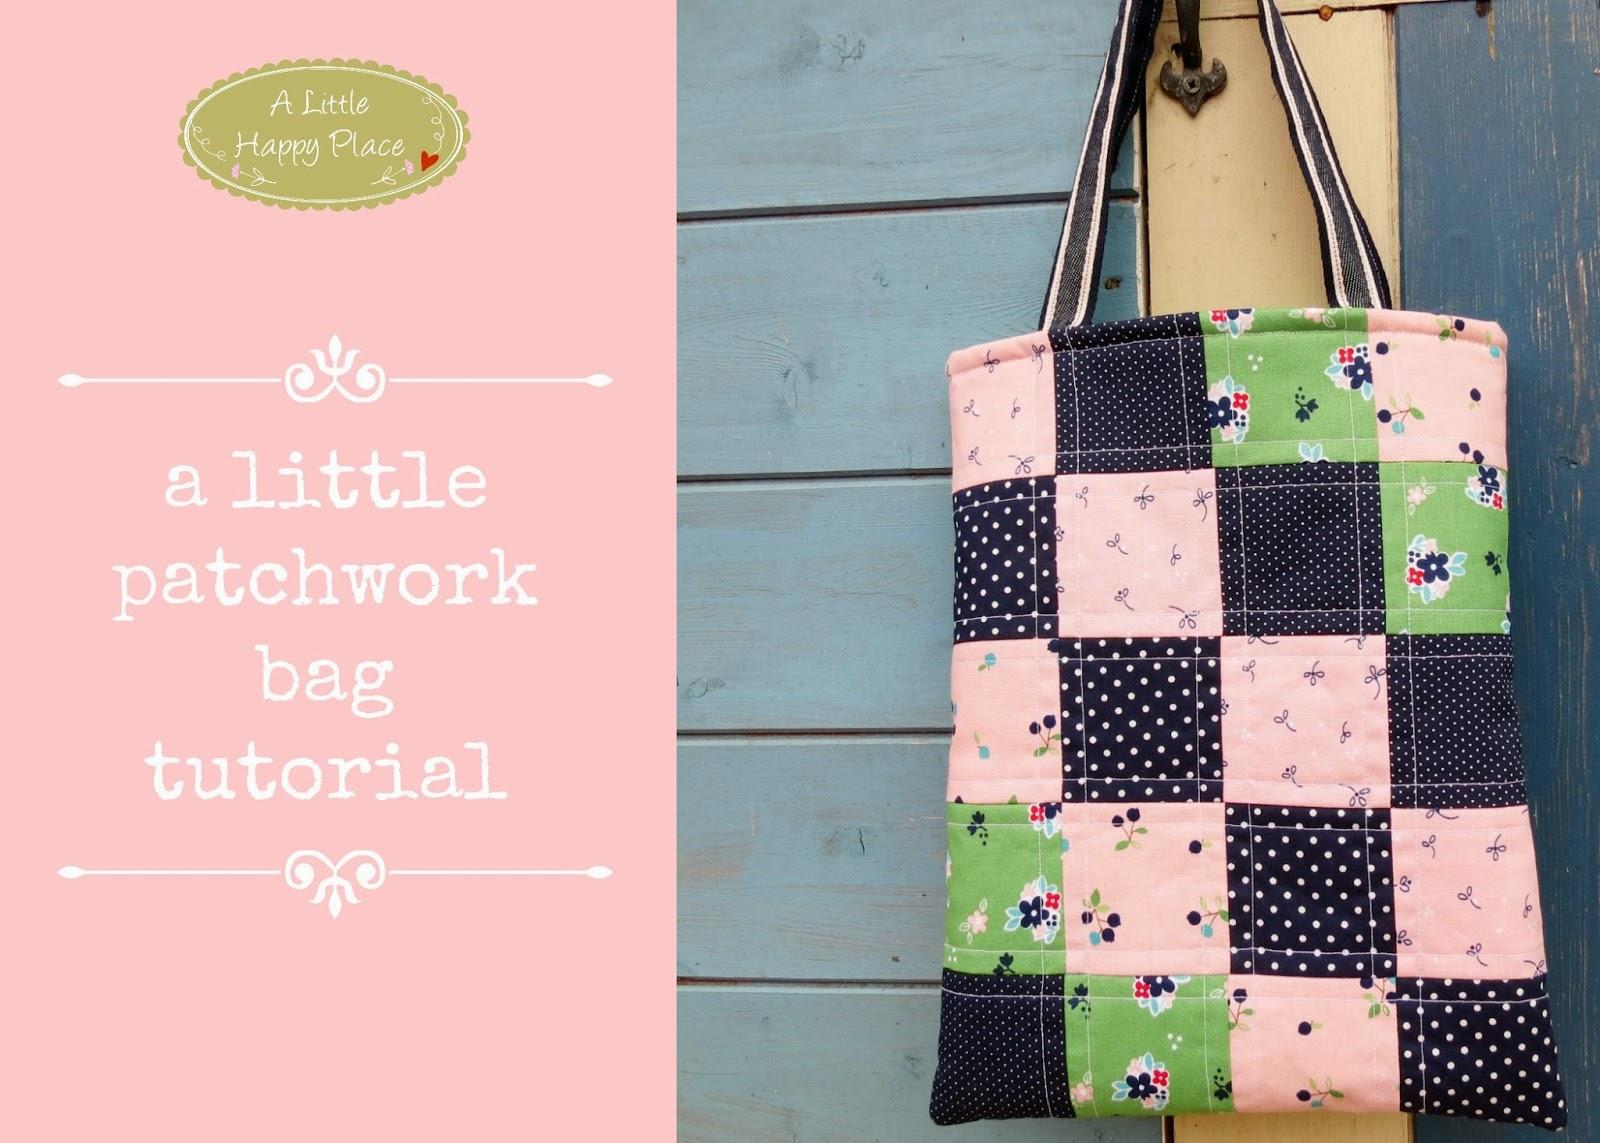 Make It A Little Patchwork Bag Tutorial